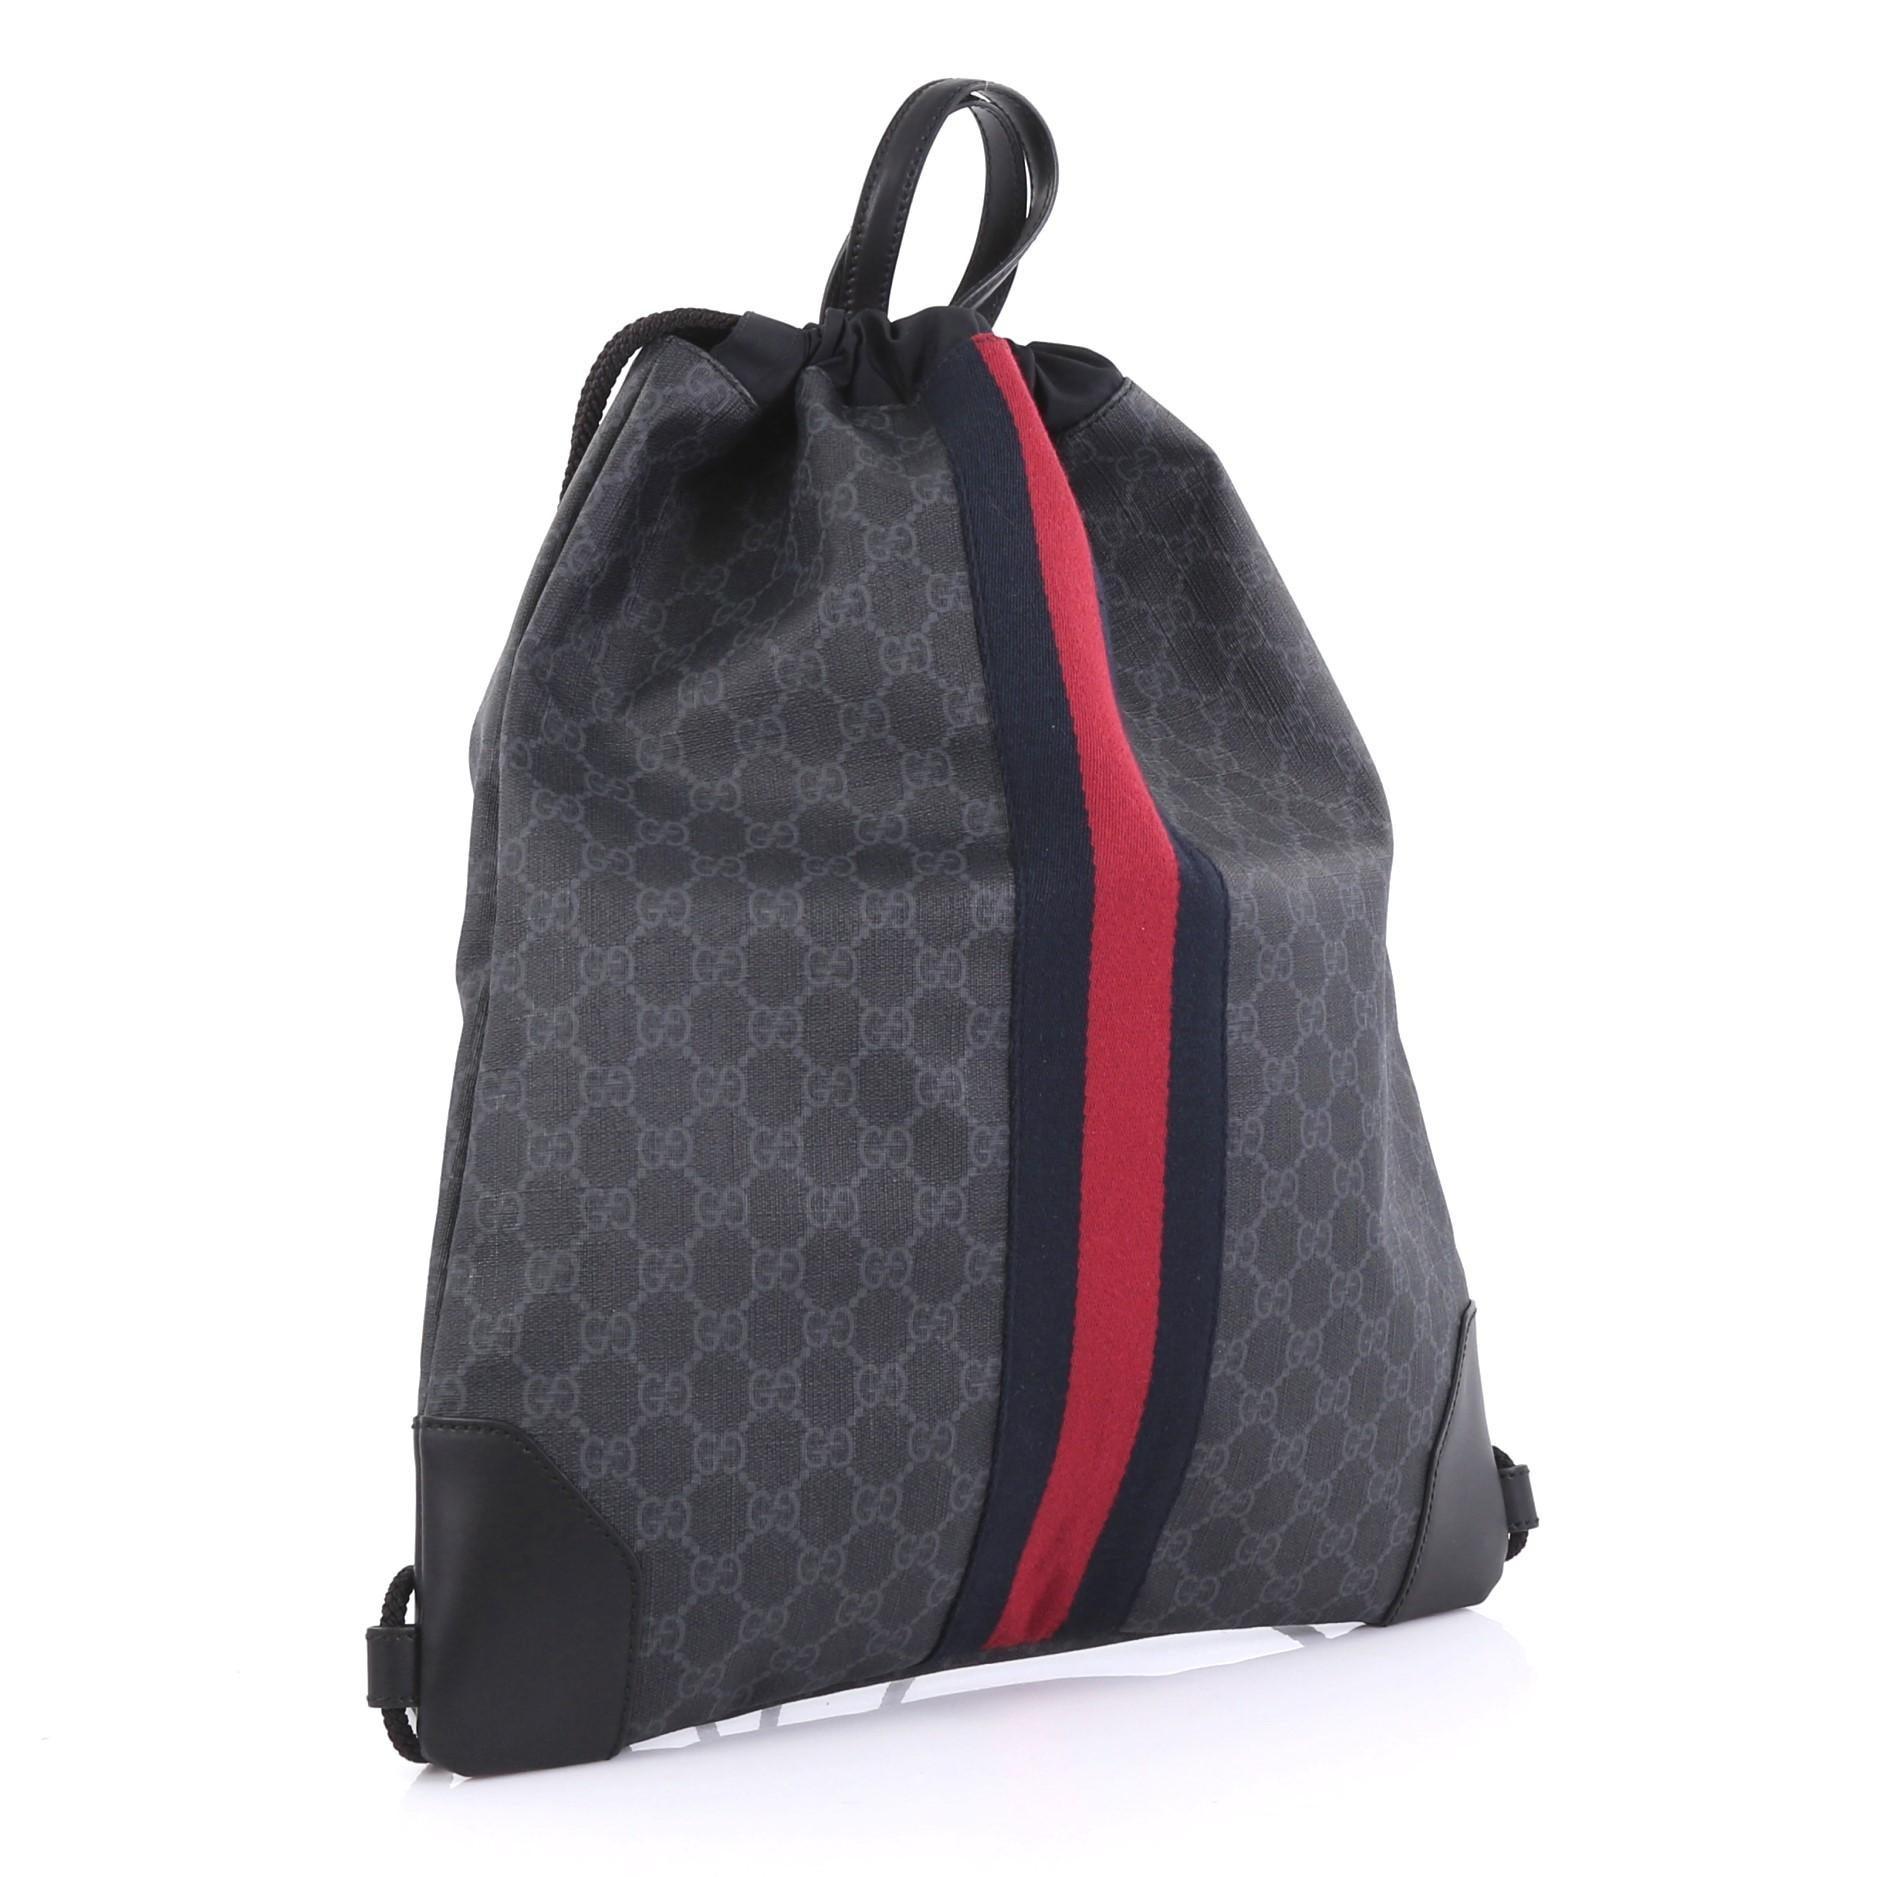 b5f252b714b9 Gucci Web Drawstring Backpack GG Coated Canvas Large at 1stdibs